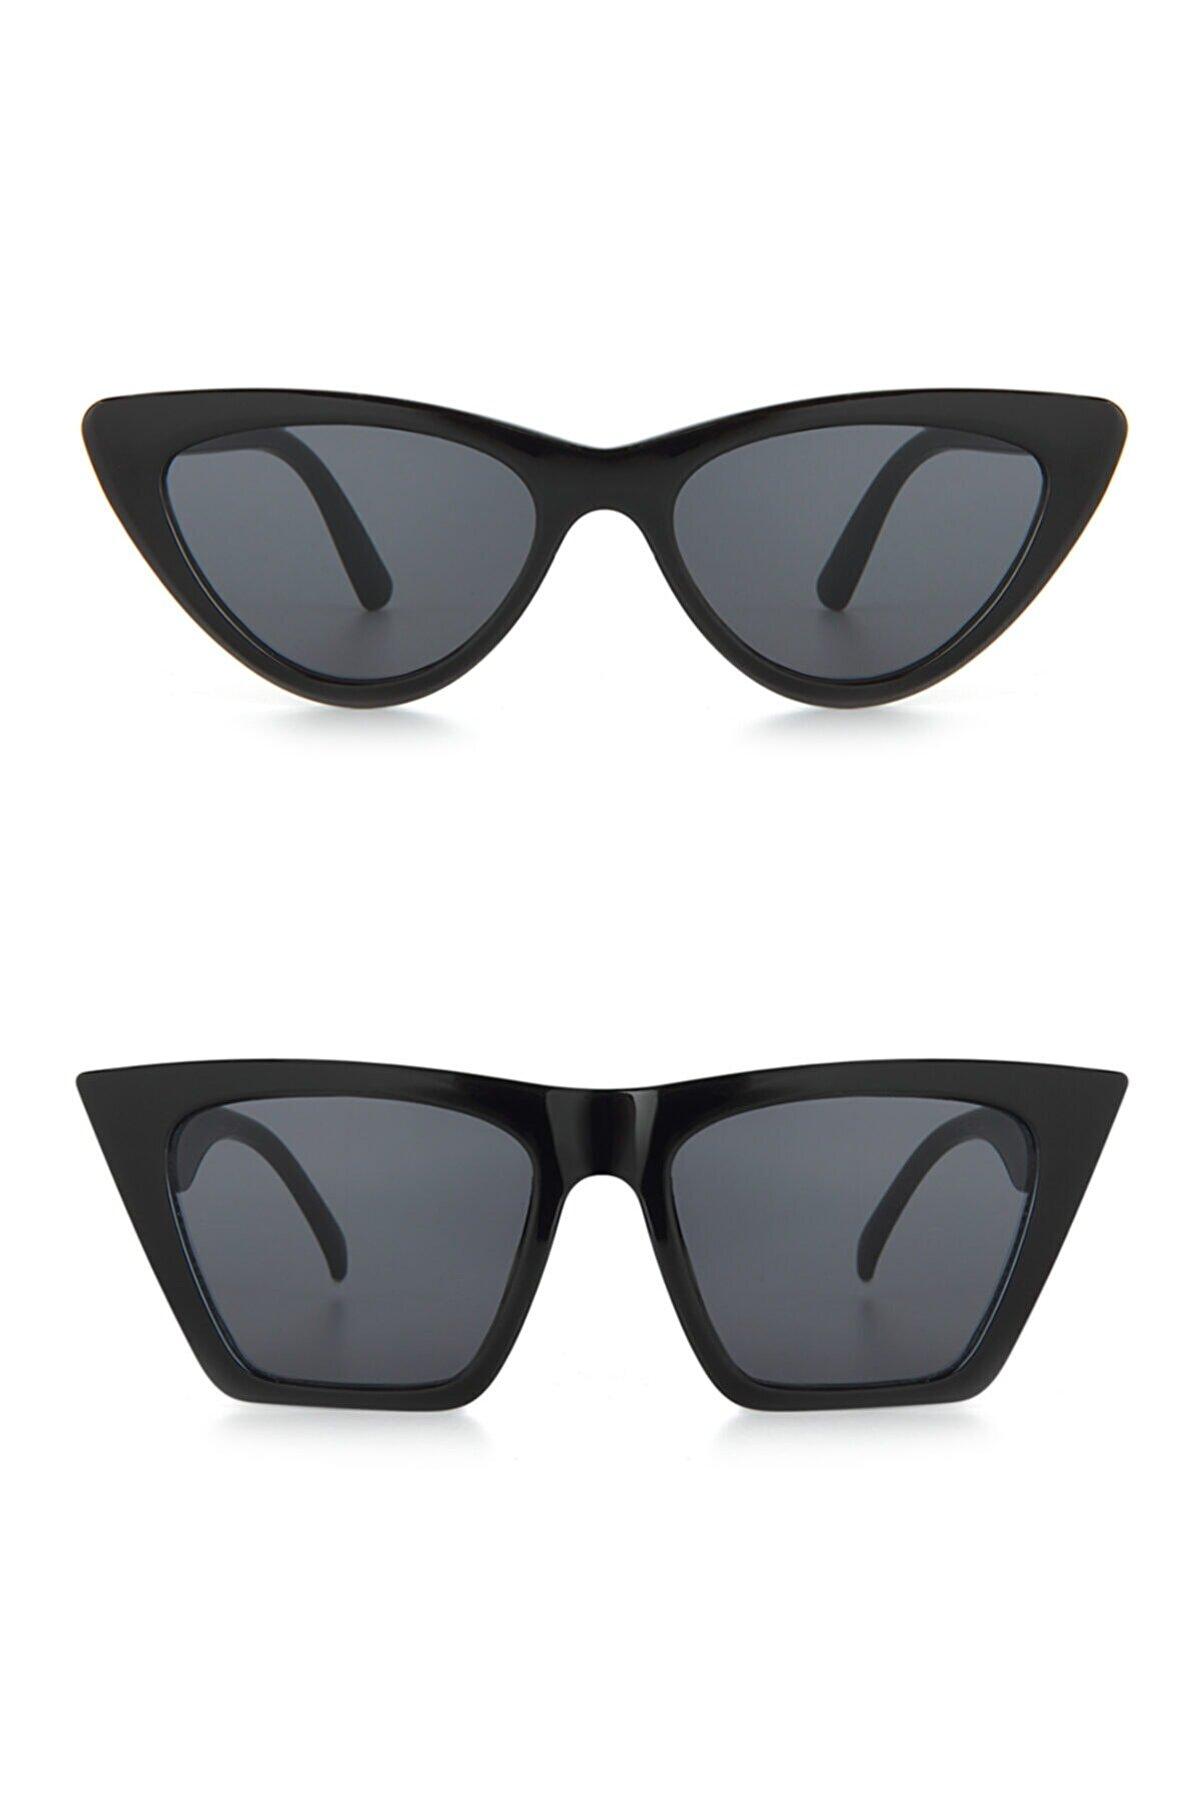 Aqua Di Polo 2'li Özel Tasarım Fırsat Seti Kadın Güneş Gözlüğü Stsa000201